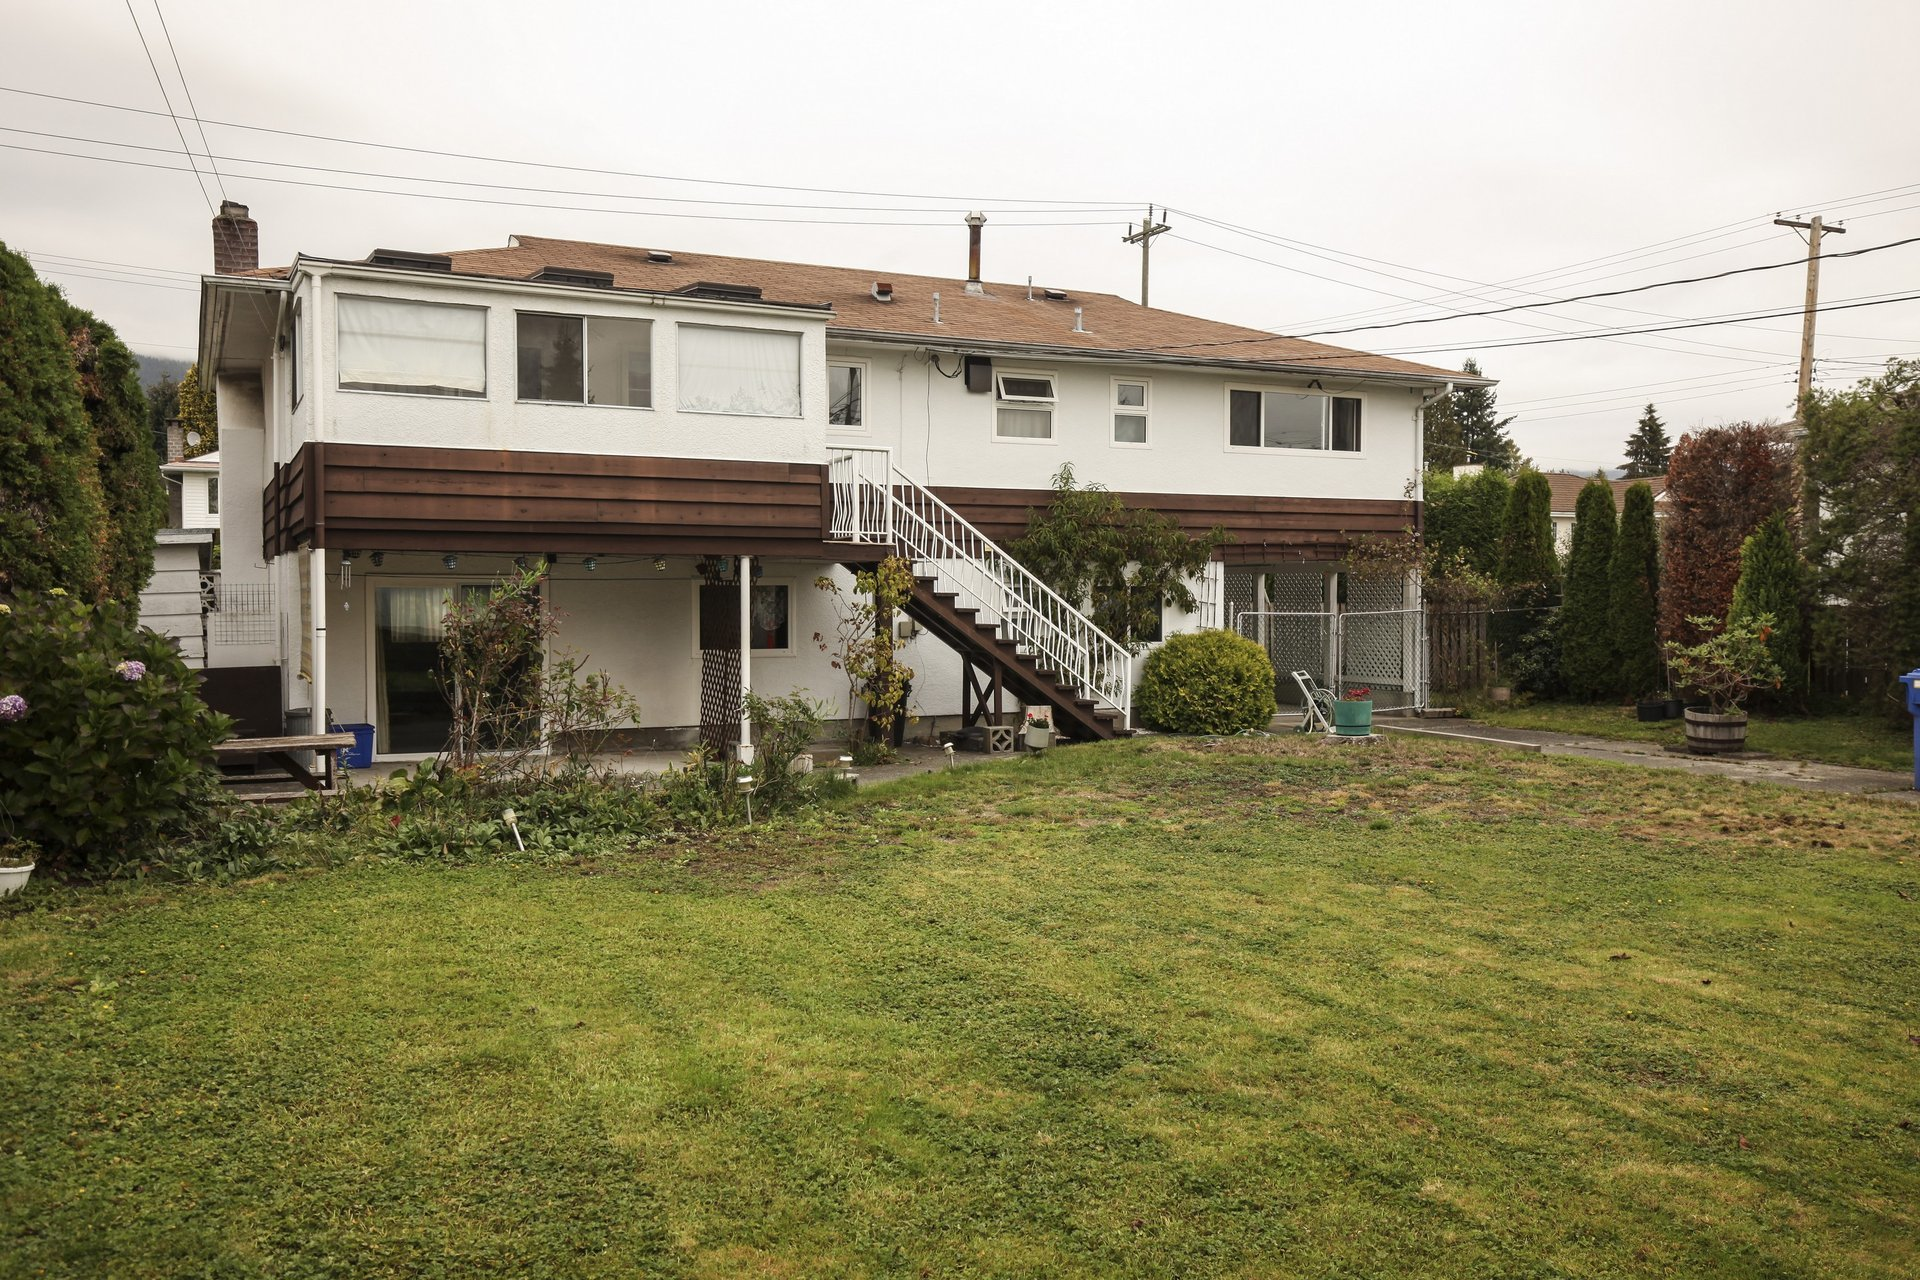 d96902c9c74266a2fa4d4bbef4b7c4e5 at 625 - 16th Street Vancouver,